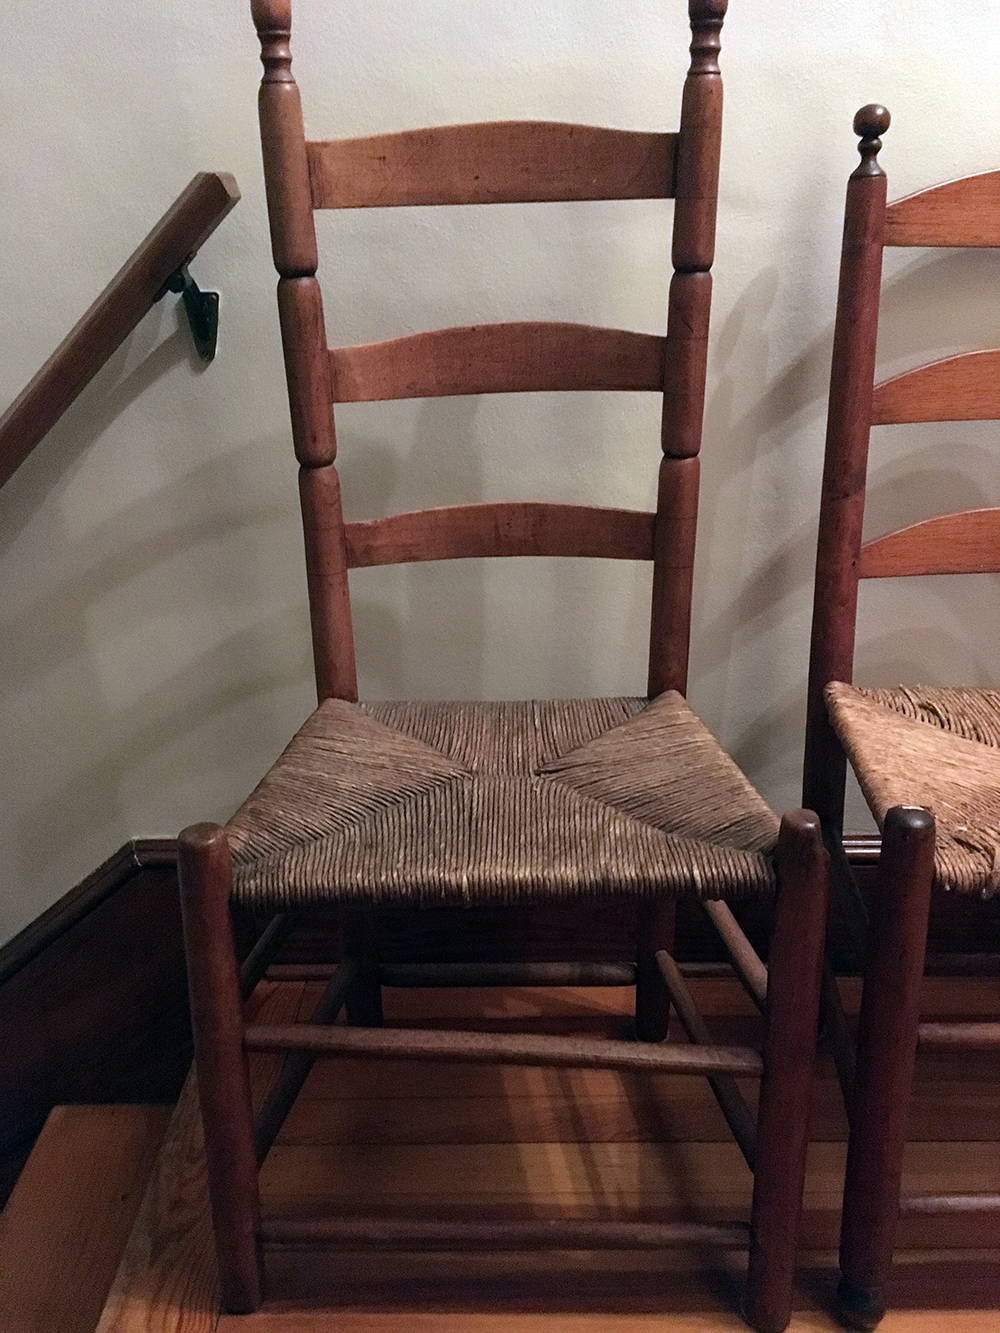 Lot 177: 2 Vintage Ladder Back Chairs